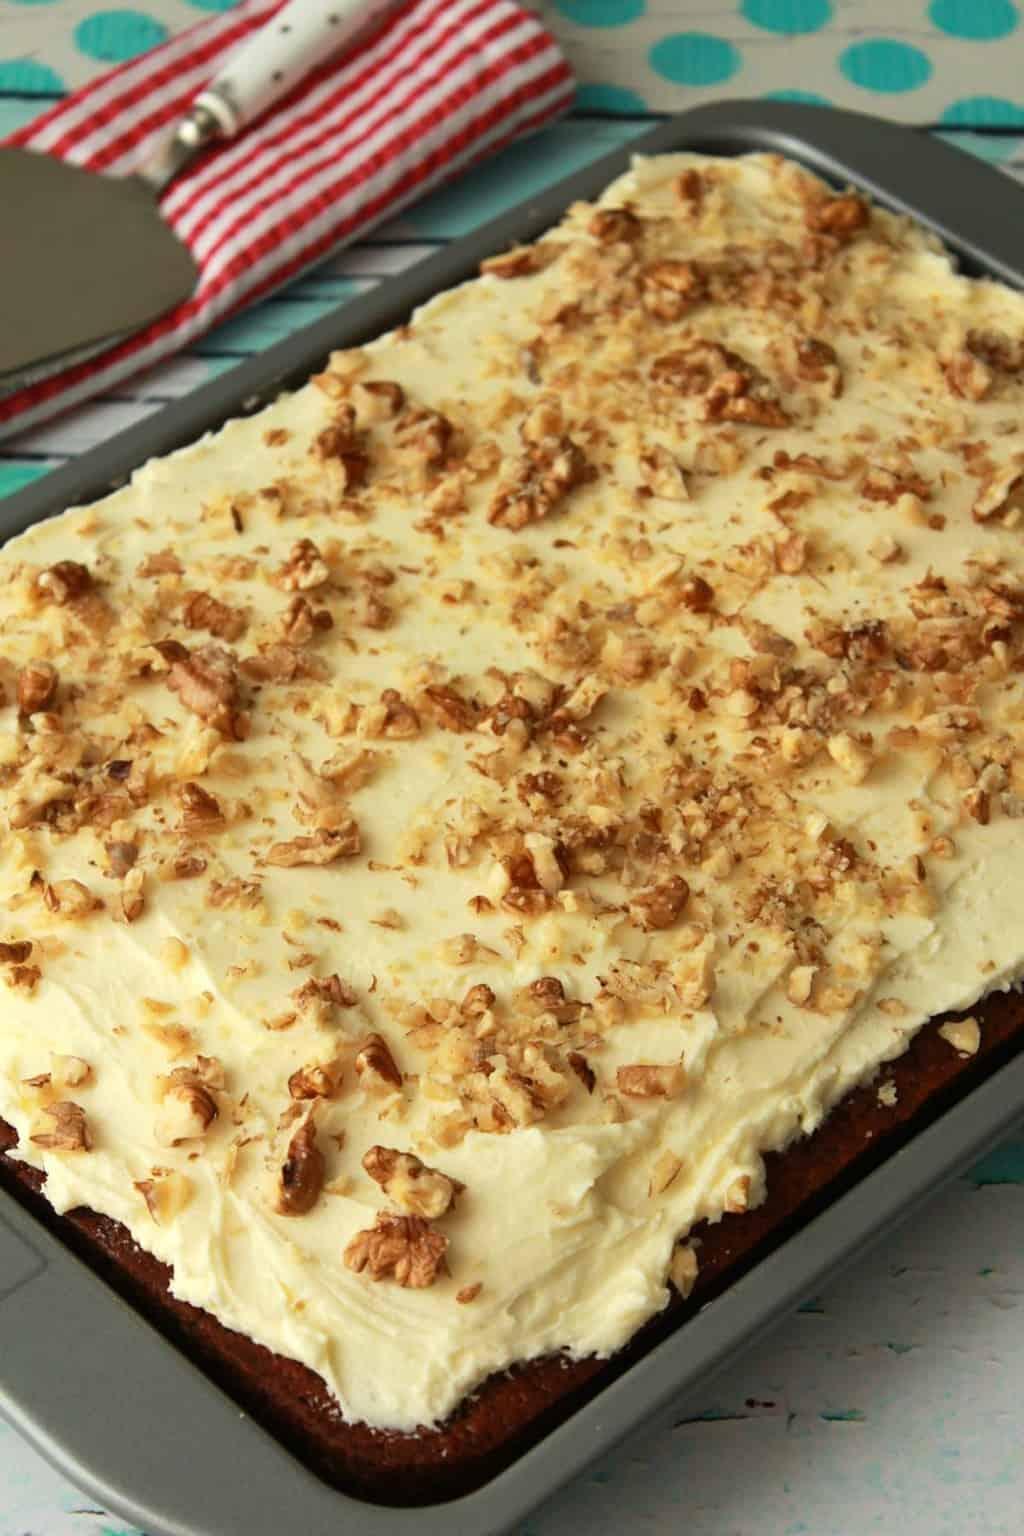 How To Make Veganbanana Cake